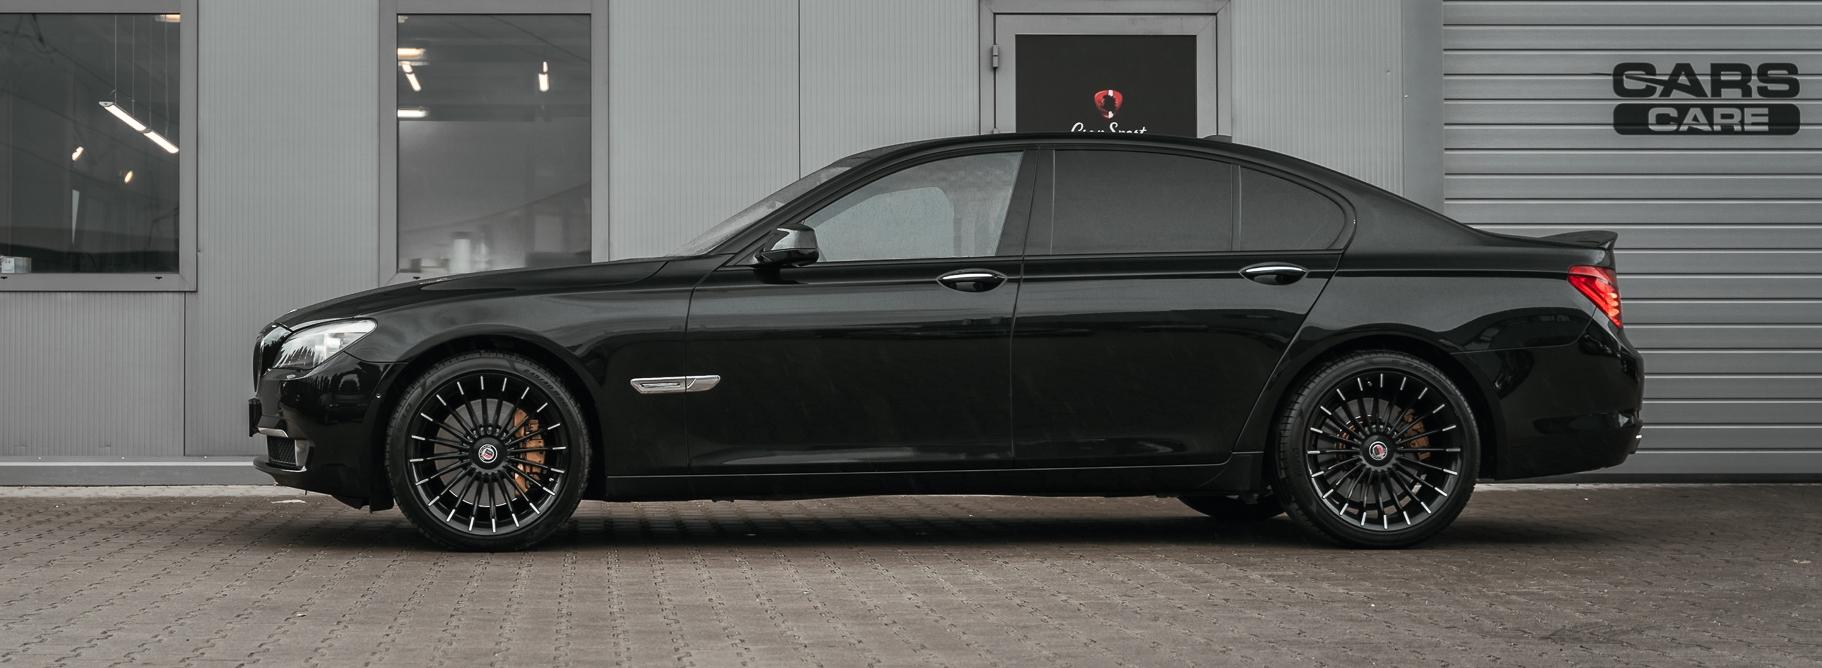 BMW 7 F01 Maxhaust